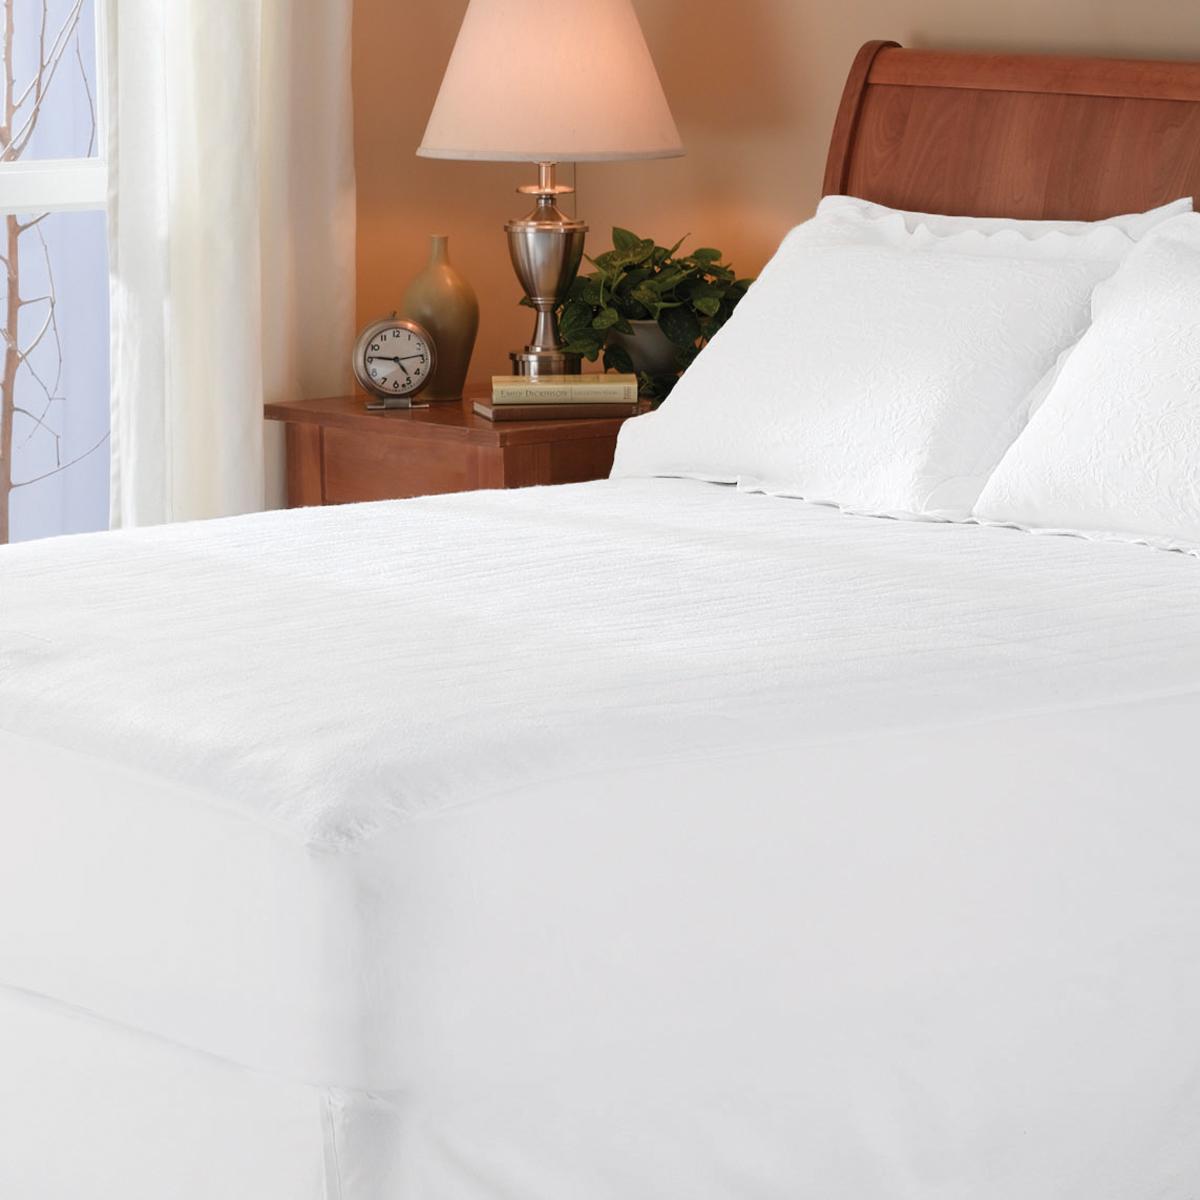 couvre matelas chauffant sunbeam piqu sunbeam canada. Black Bedroom Furniture Sets. Home Design Ideas